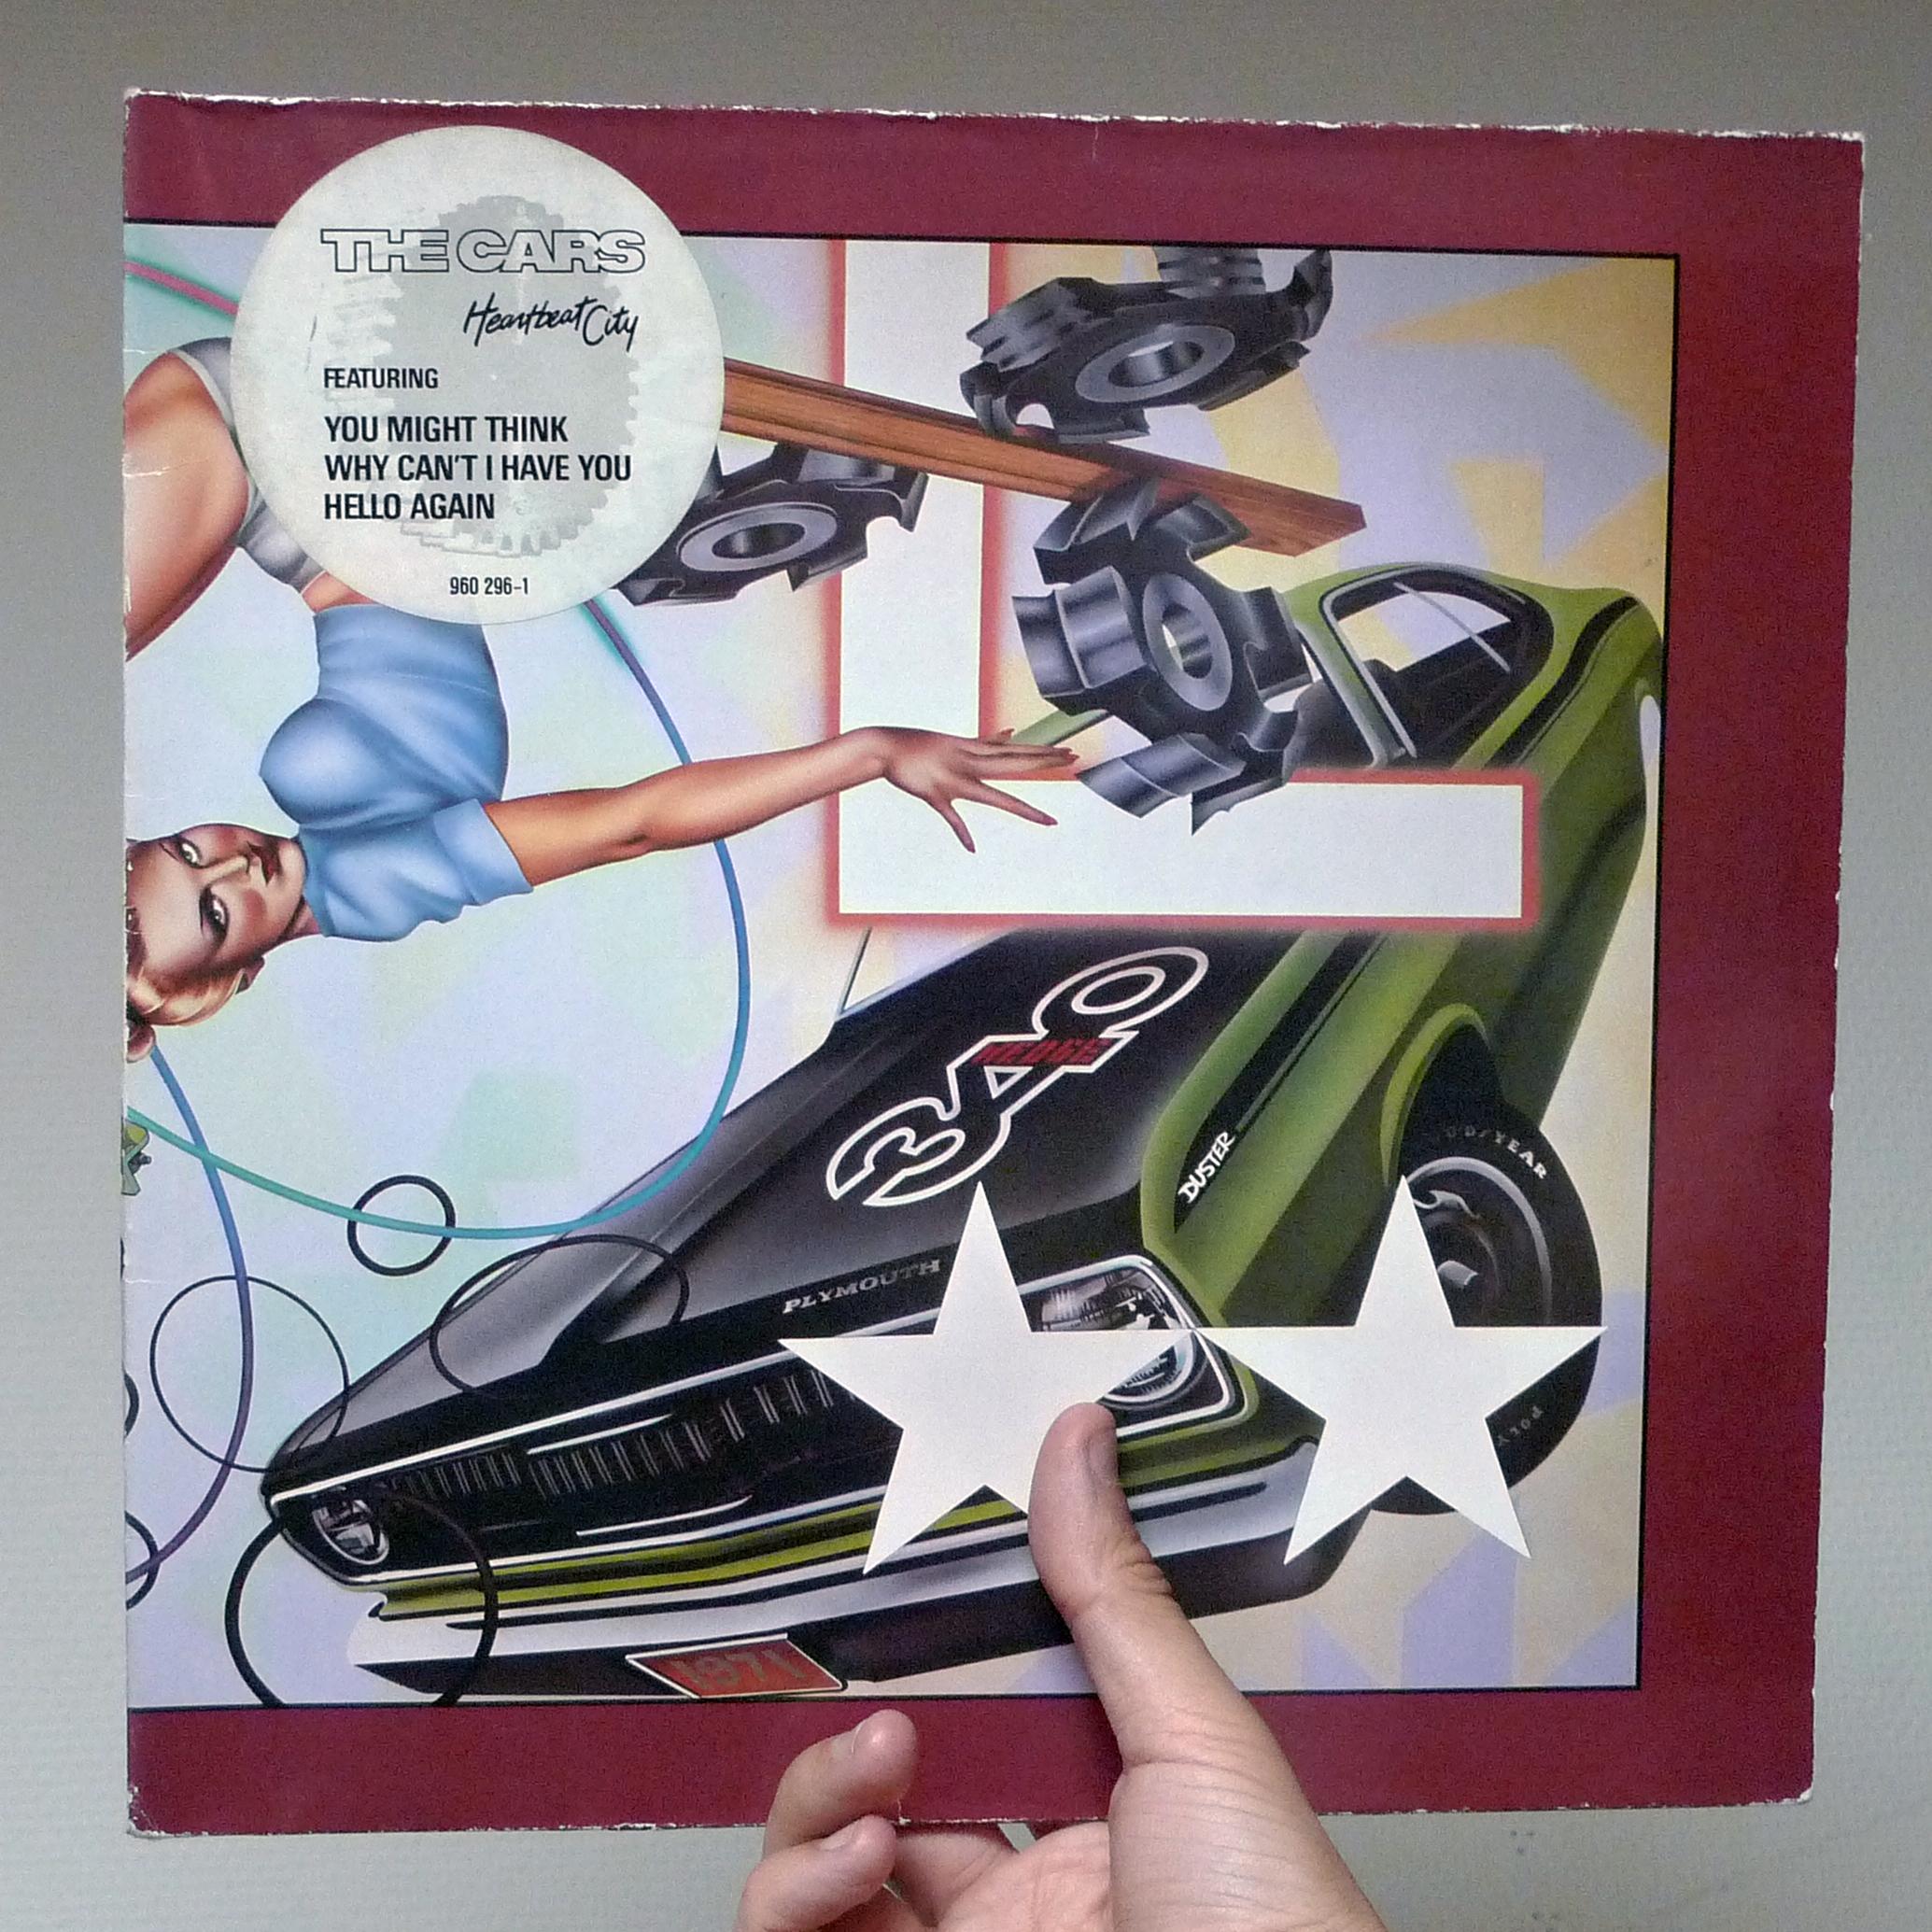 dj50 ep121 sleeve thecars